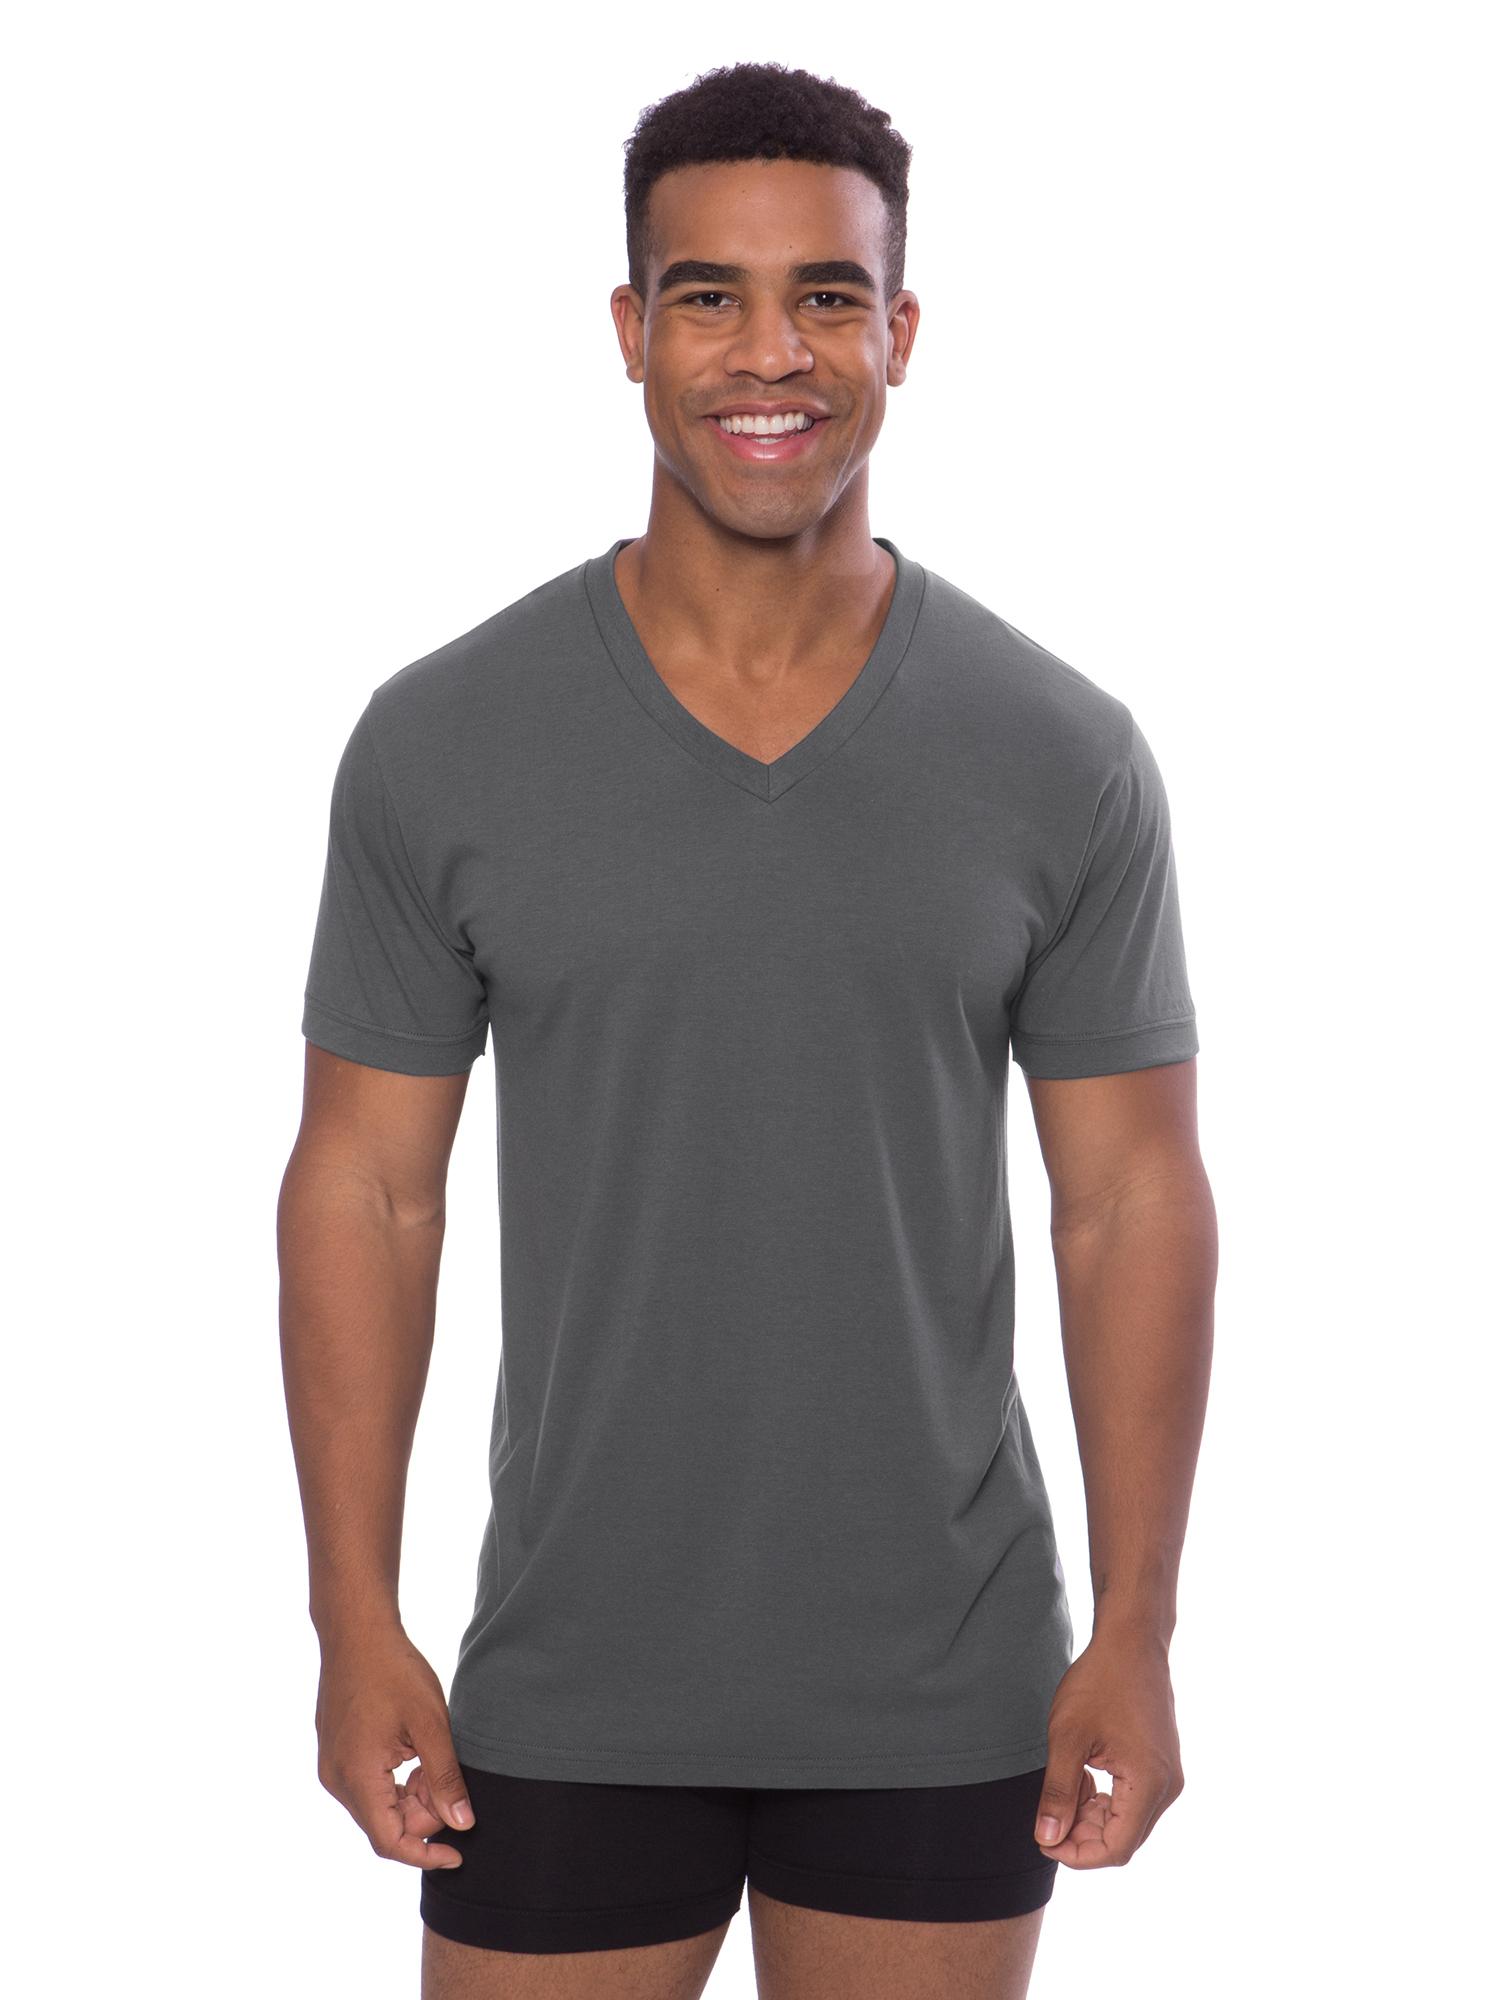 Best Lounge Wear for Him Meio, Black, ST Texere Mens V-Neck Luxury Undershirt